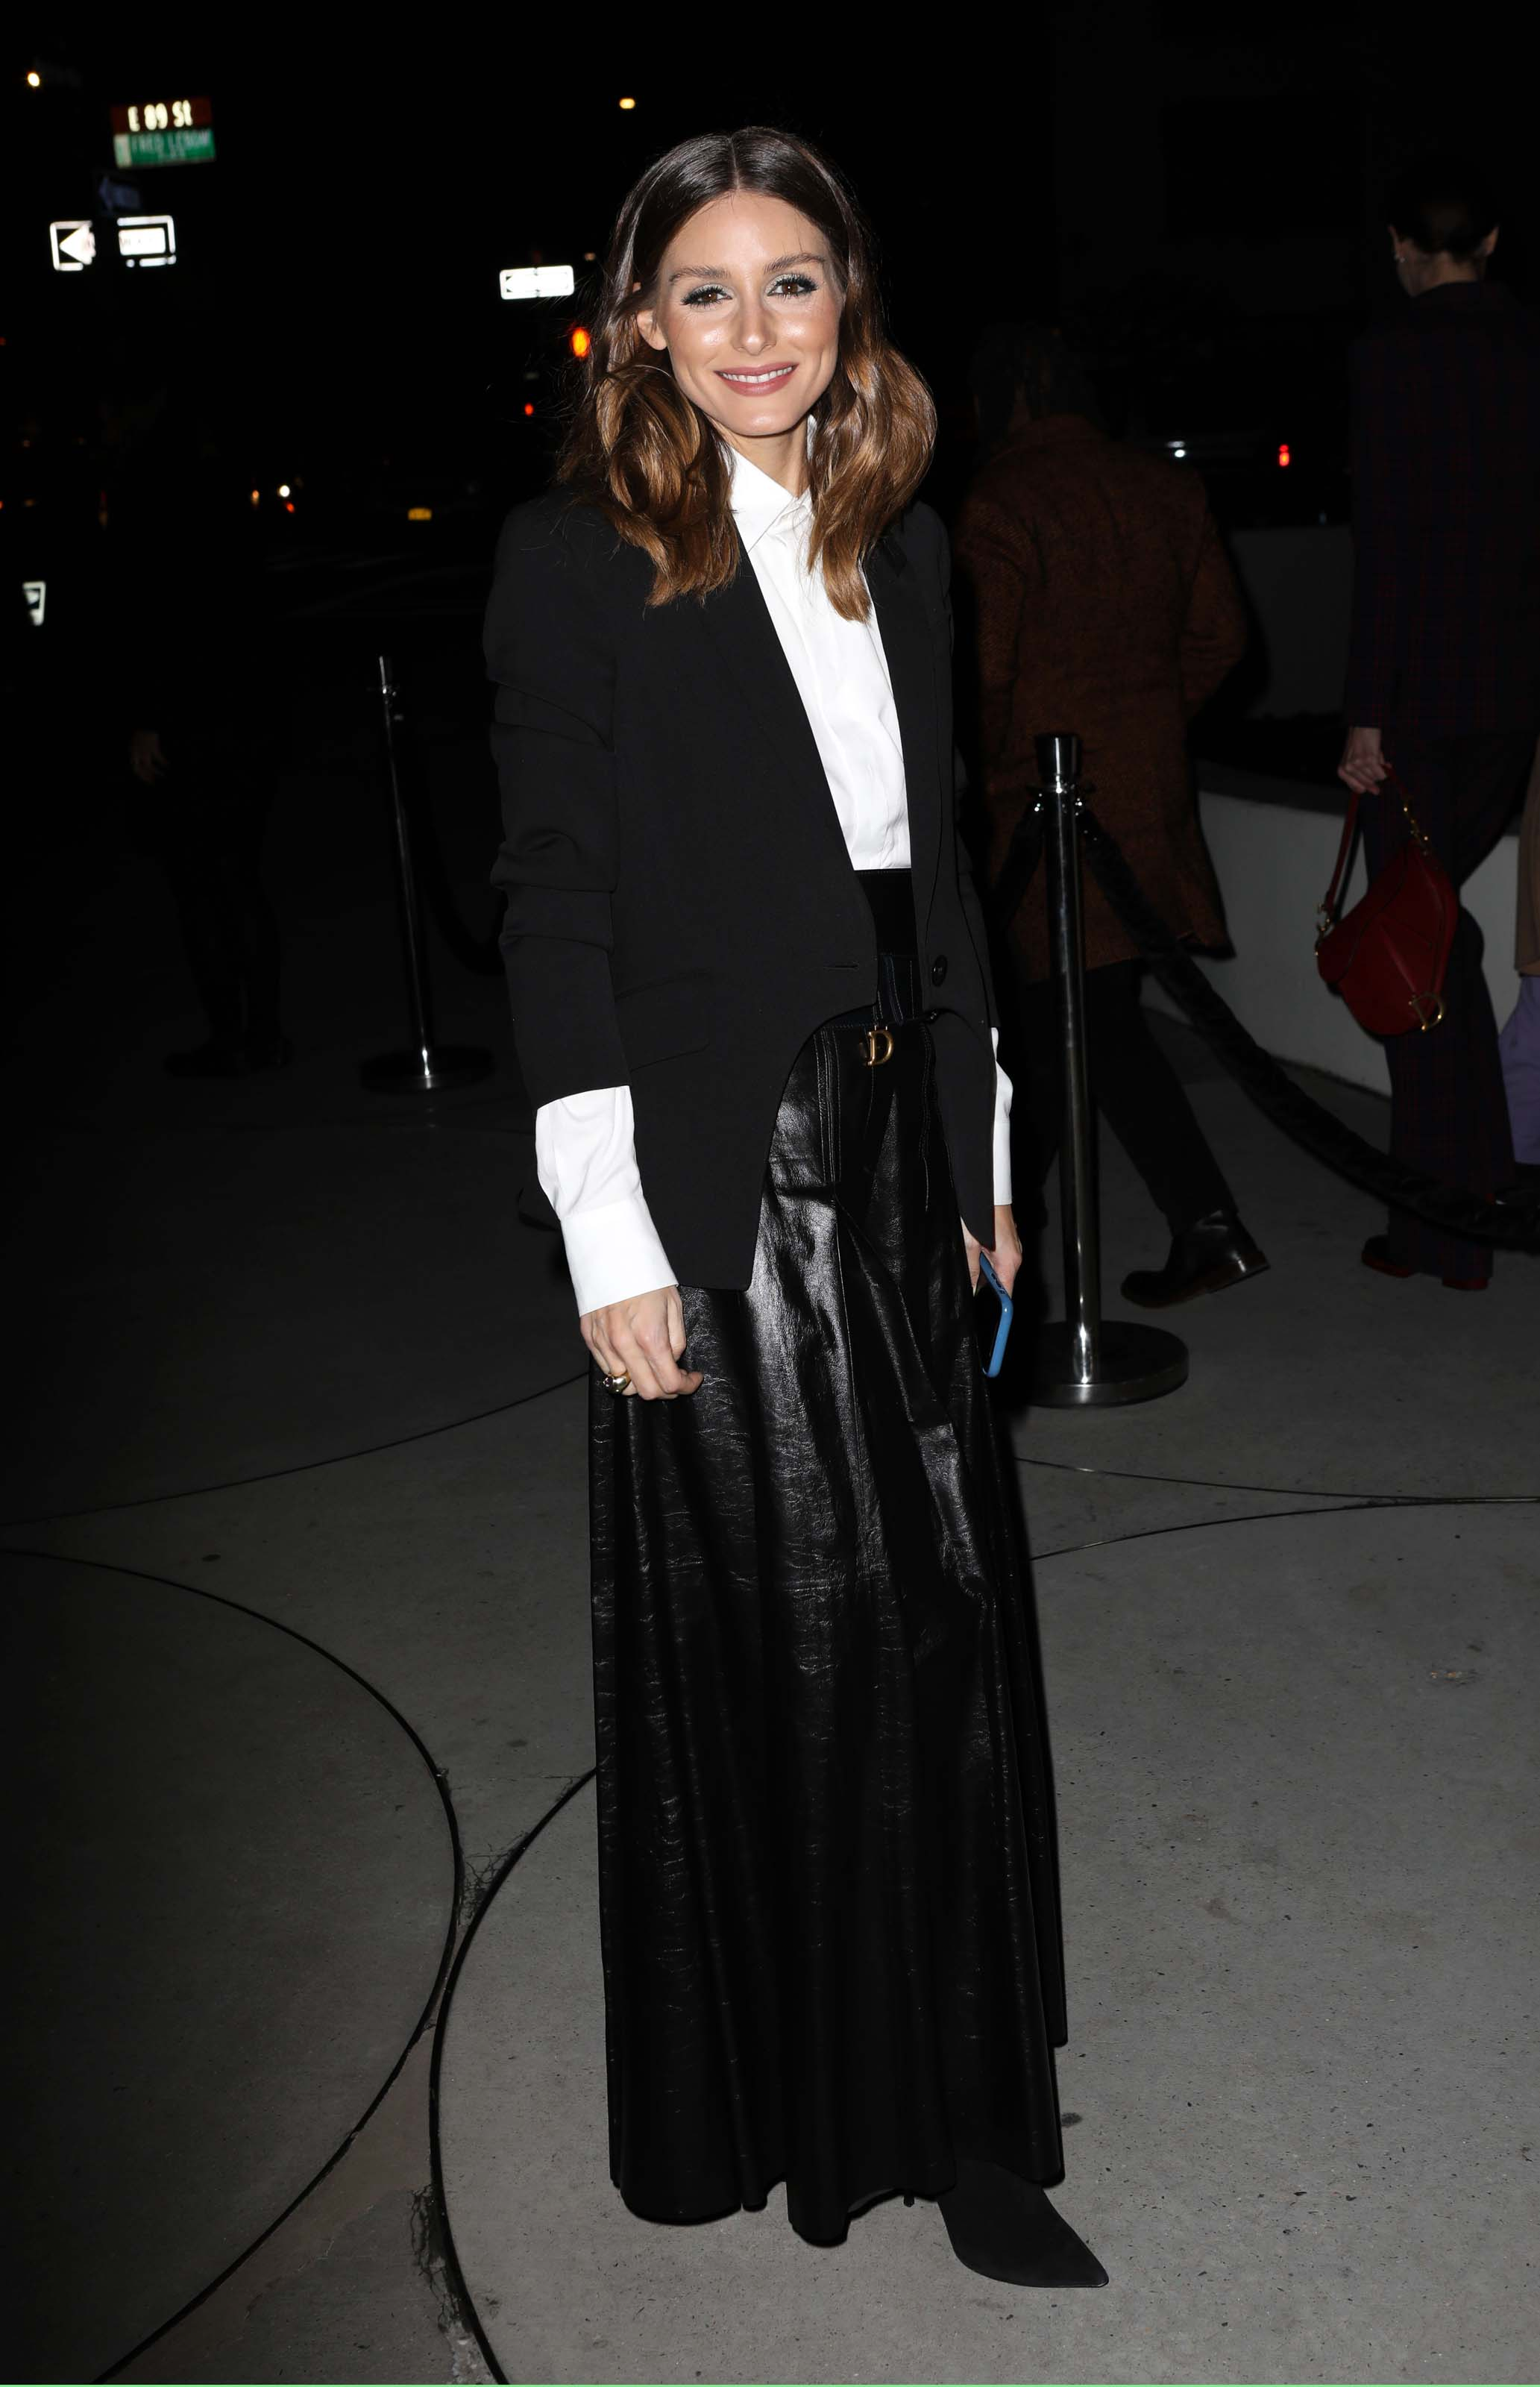 Olivia Palermo attends 2018 Guggenheim International Gala Pre-Party